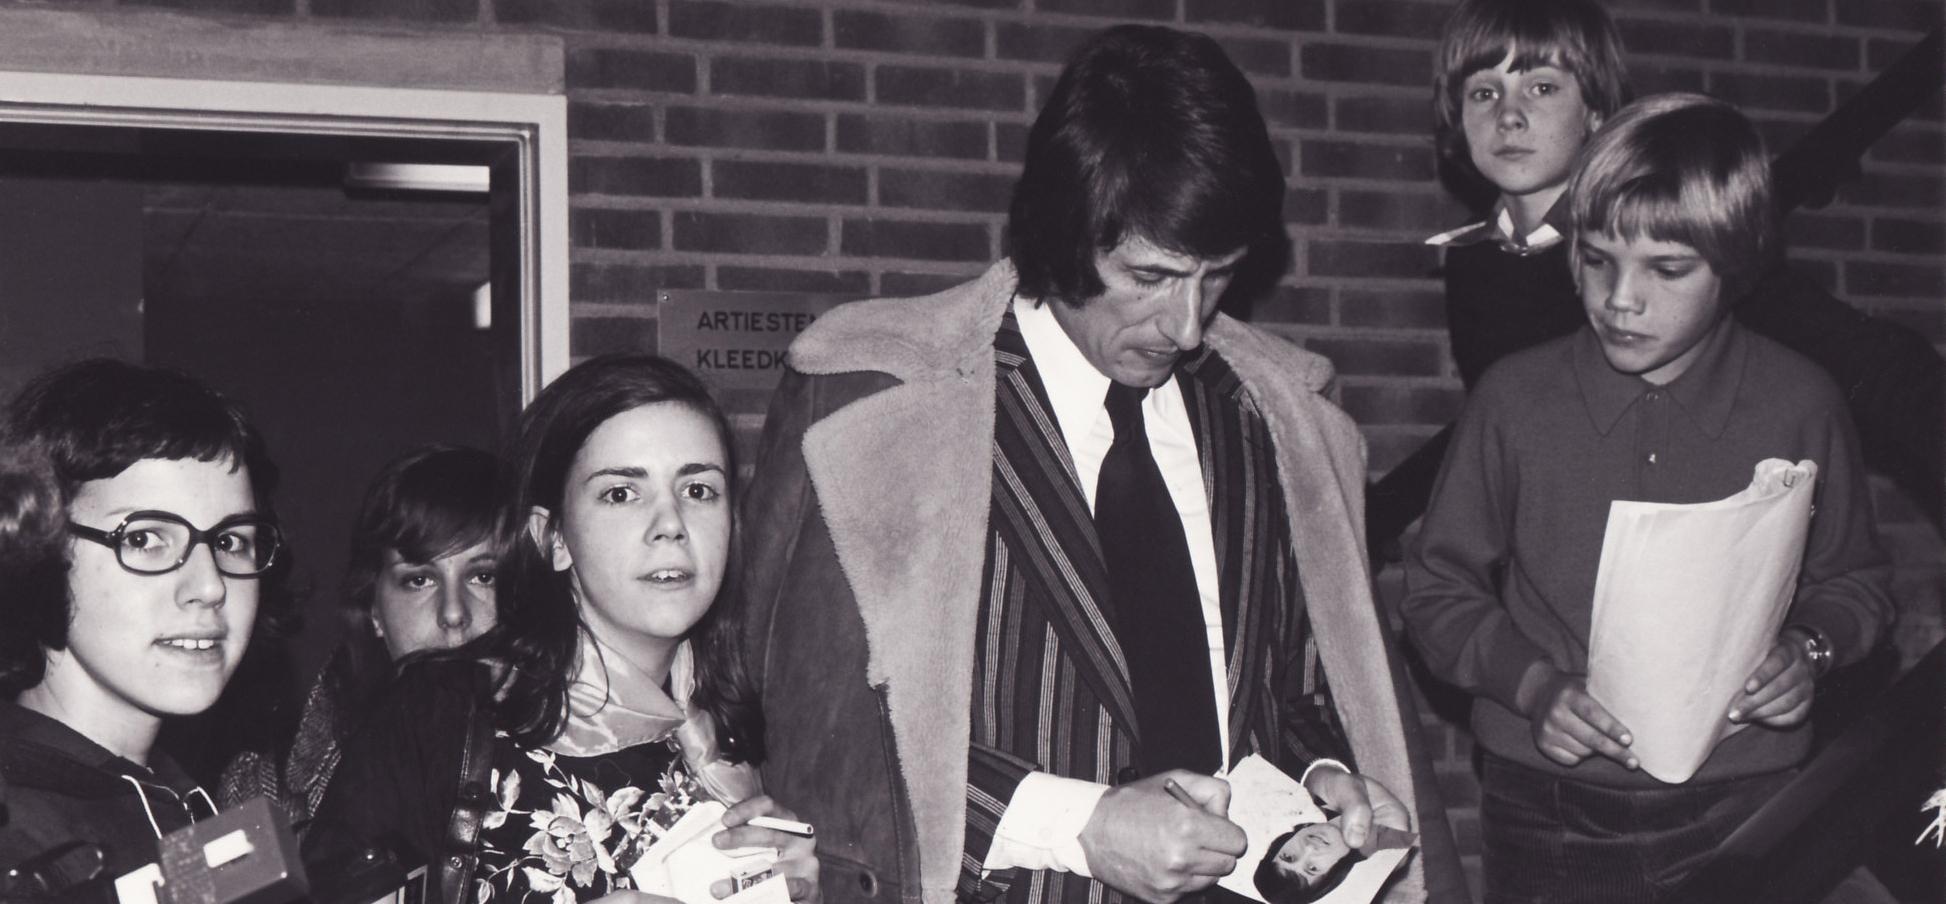 Udo Jürgens 1974 in Amsterdam